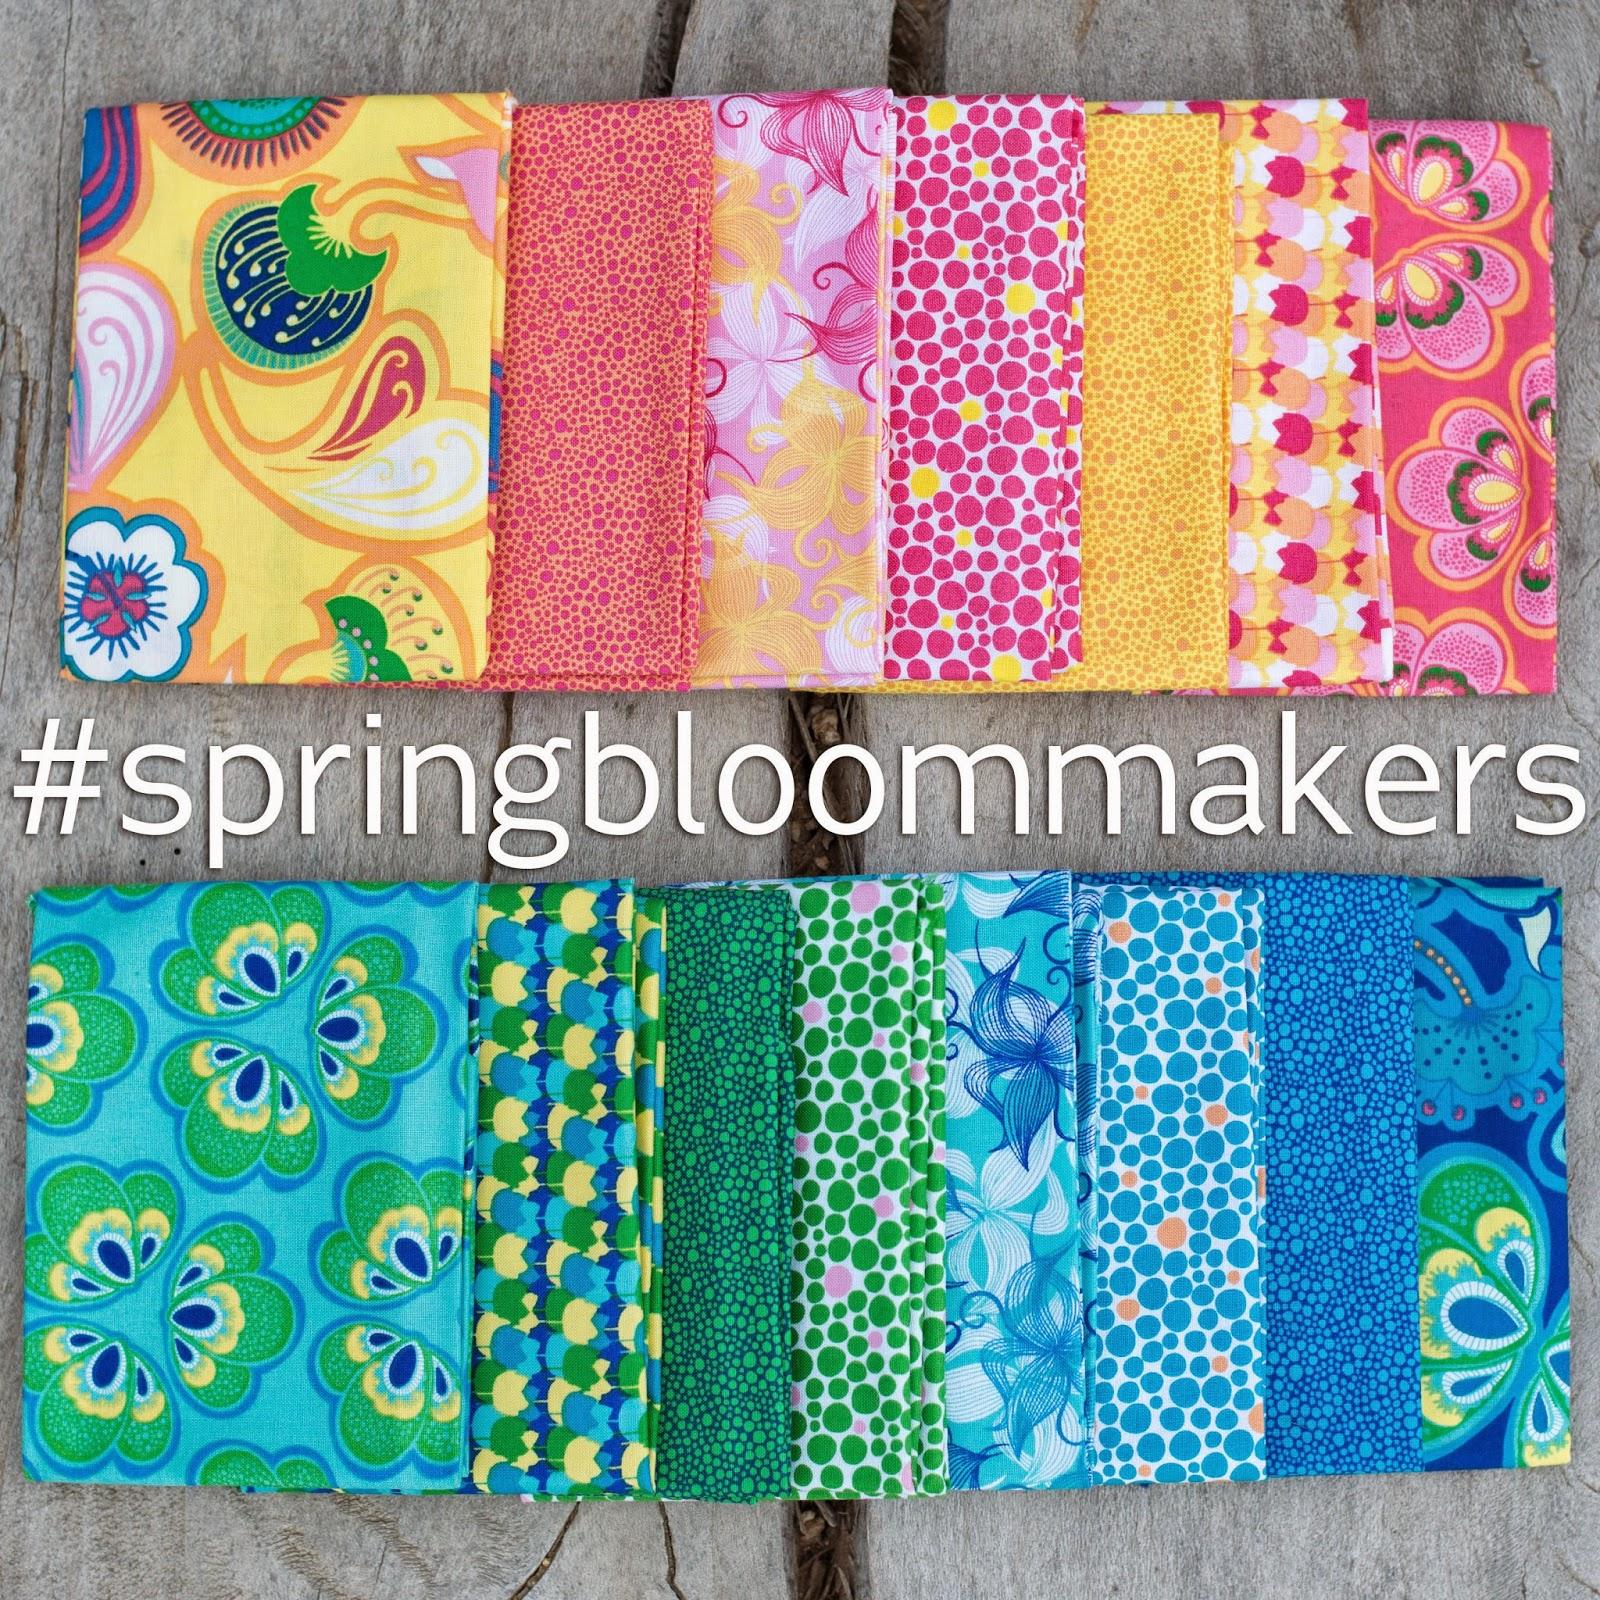 Spring Bloom Makers, Fabric Design, Windham Fabrics, Bella Caronia